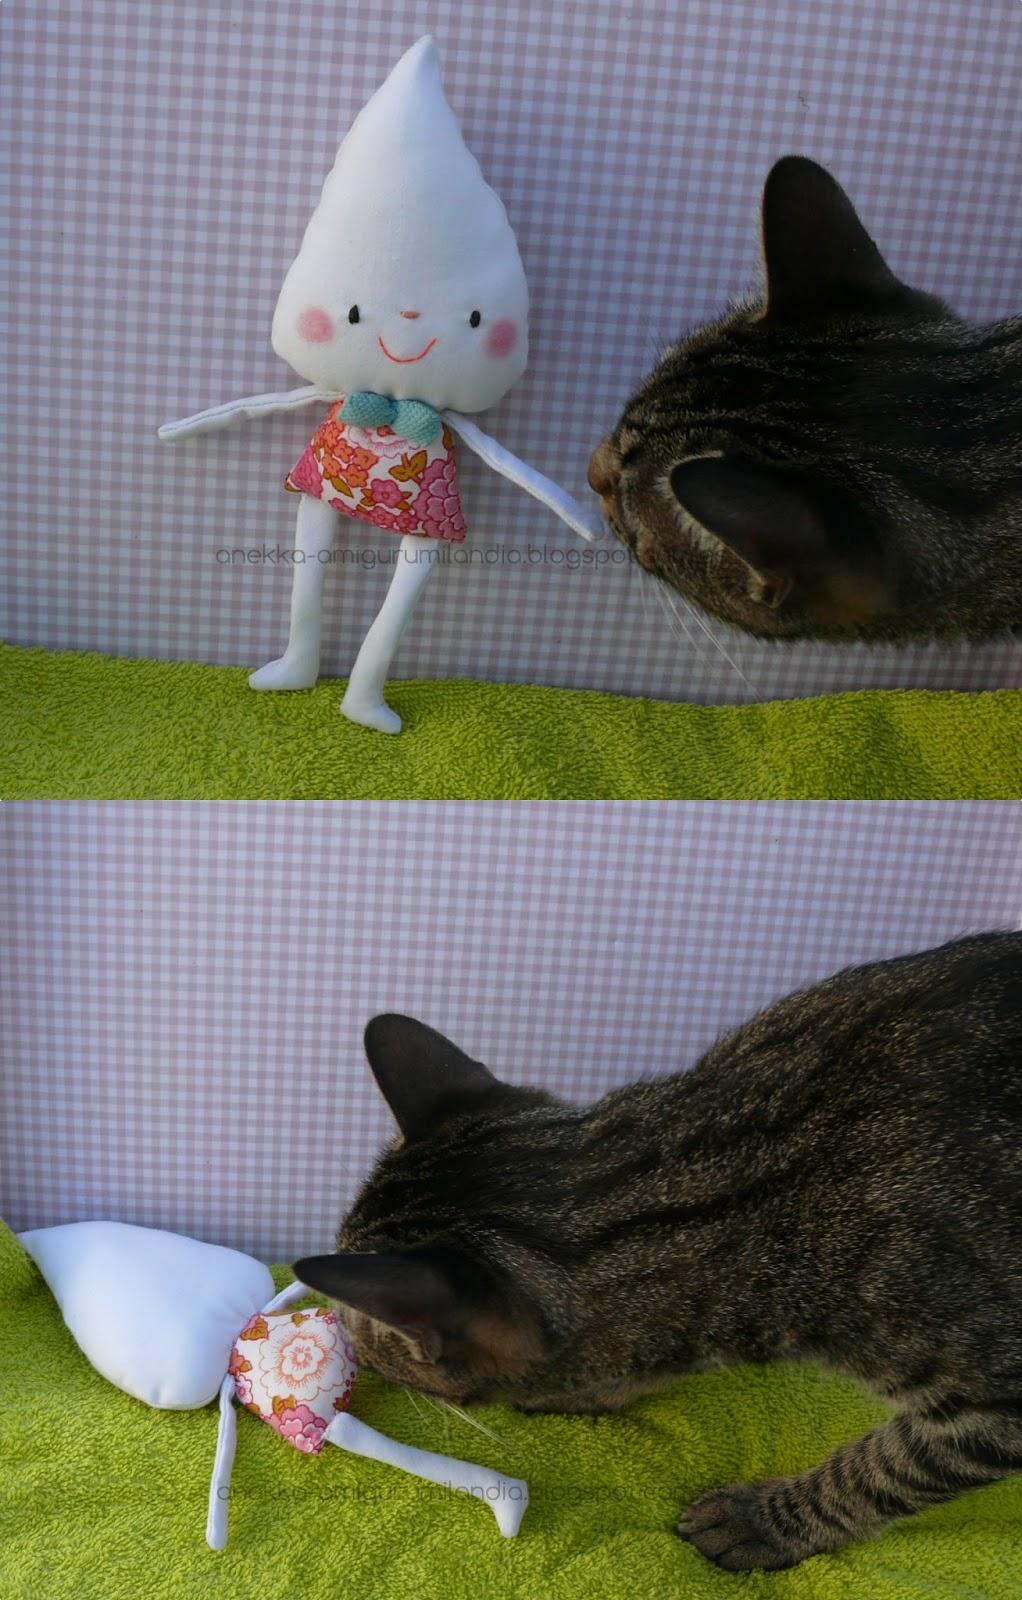 cat and  plush doll anekka handmade